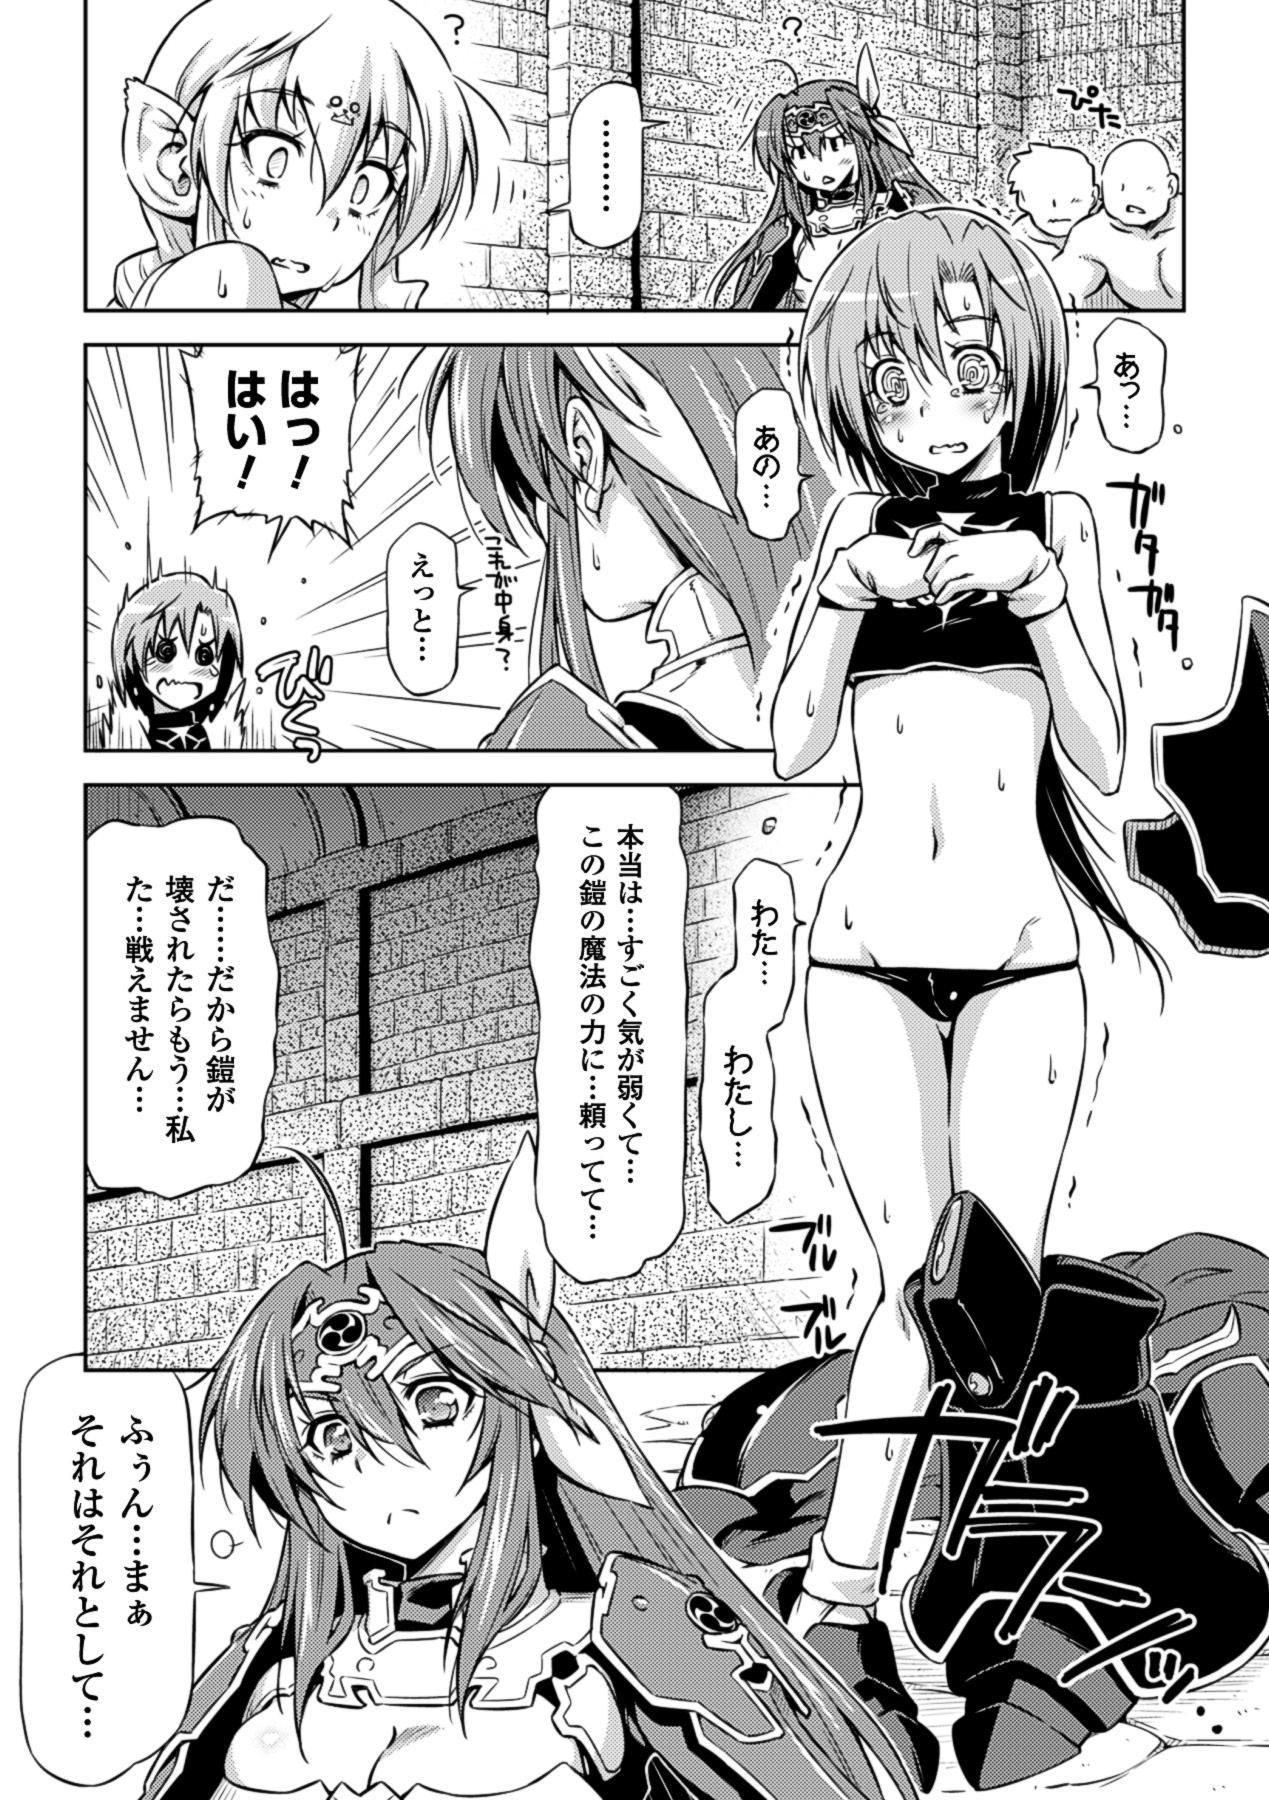 Megami Crisis 10 60